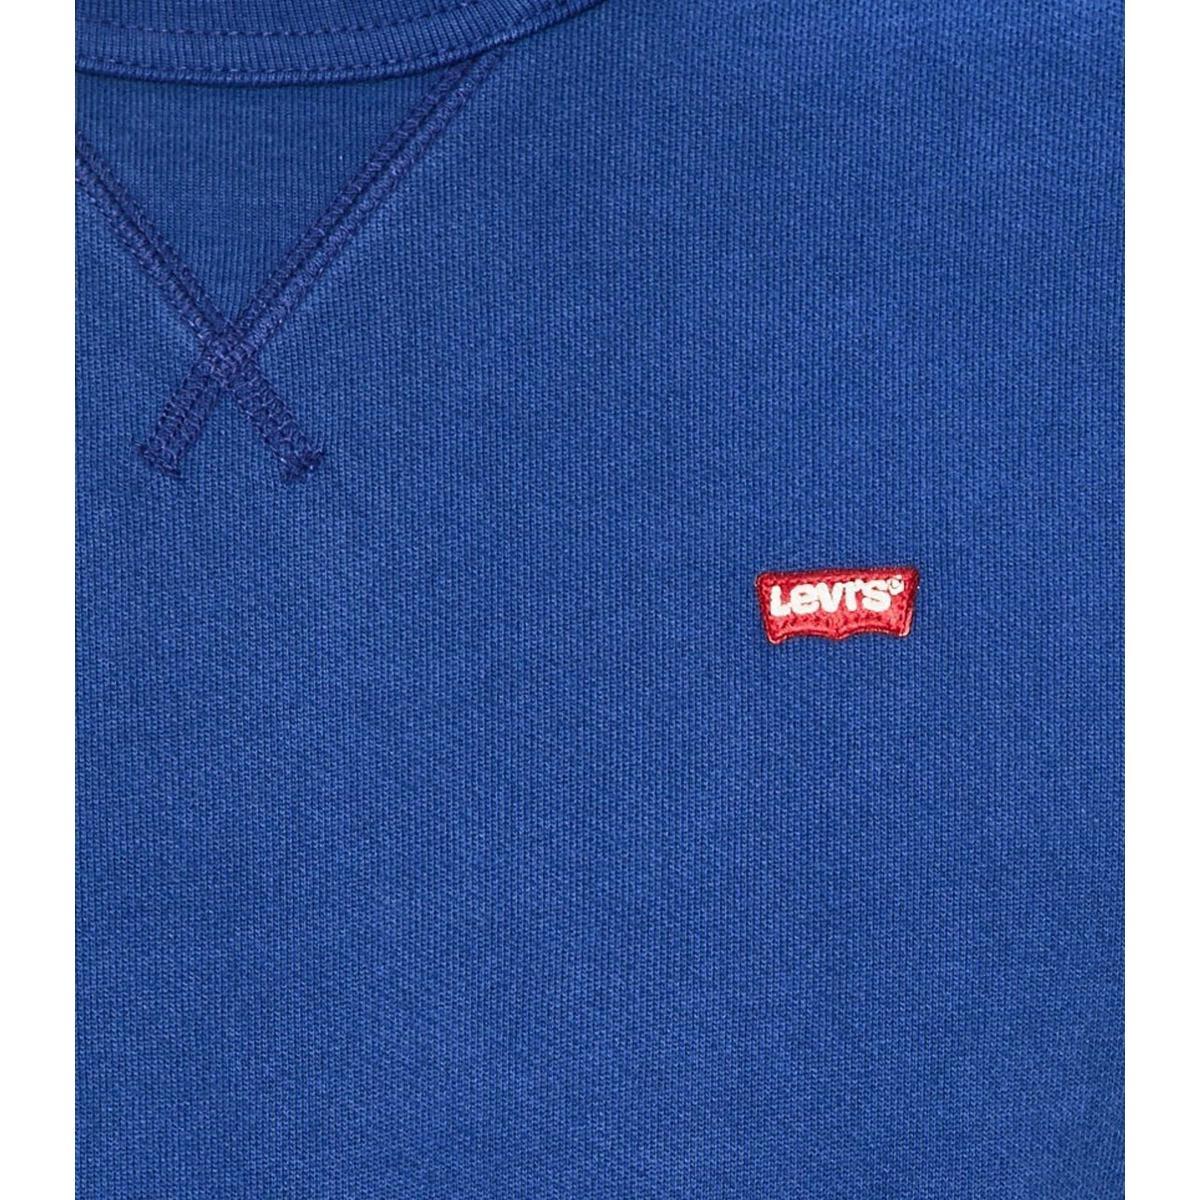 Felpa Levi's Chest Logo Crewneck Sweatshirt con logo da uomo rif. 56176-0013